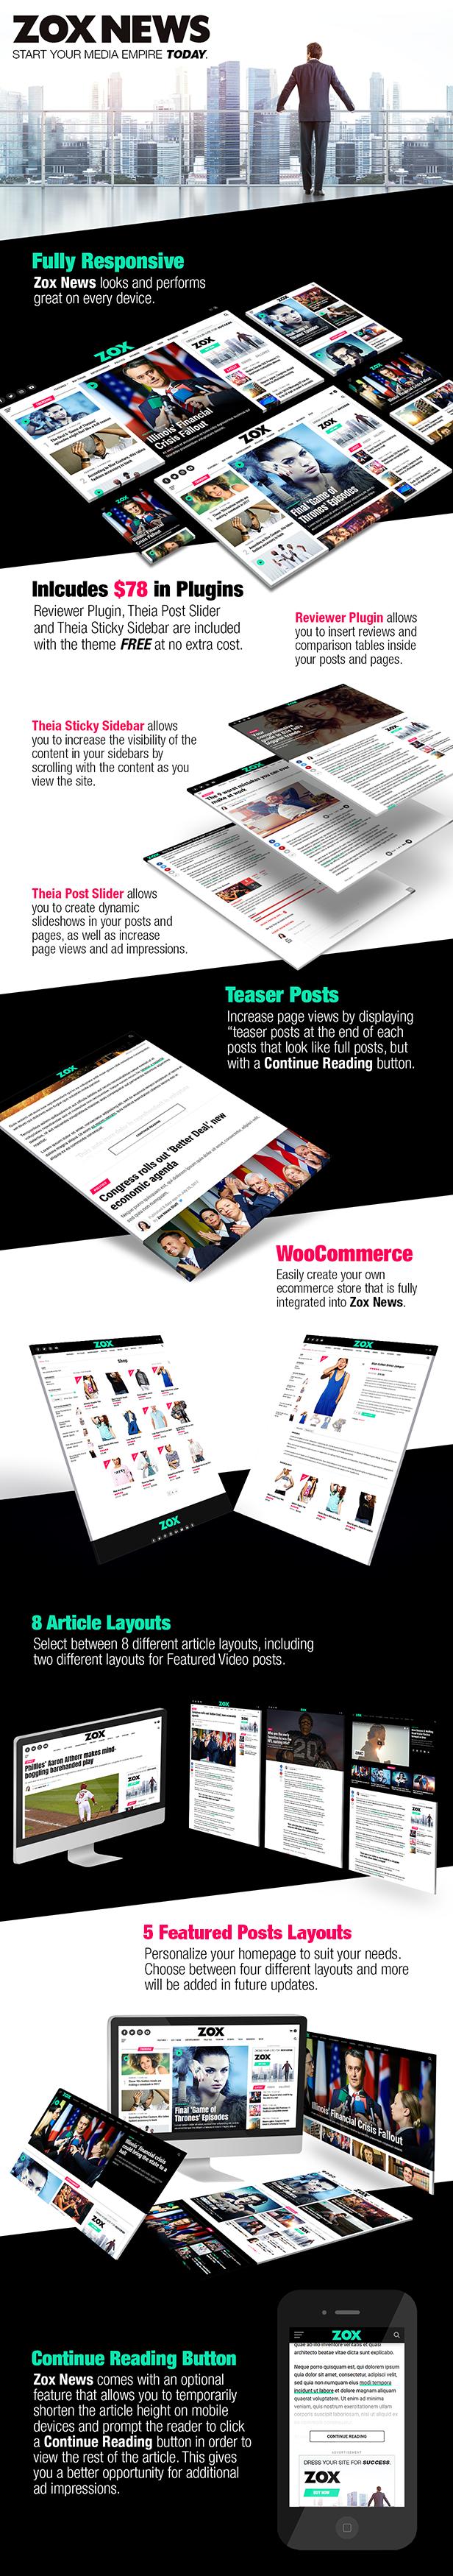 Zox News v3.11 Professional WordPress News & Magazine Theme